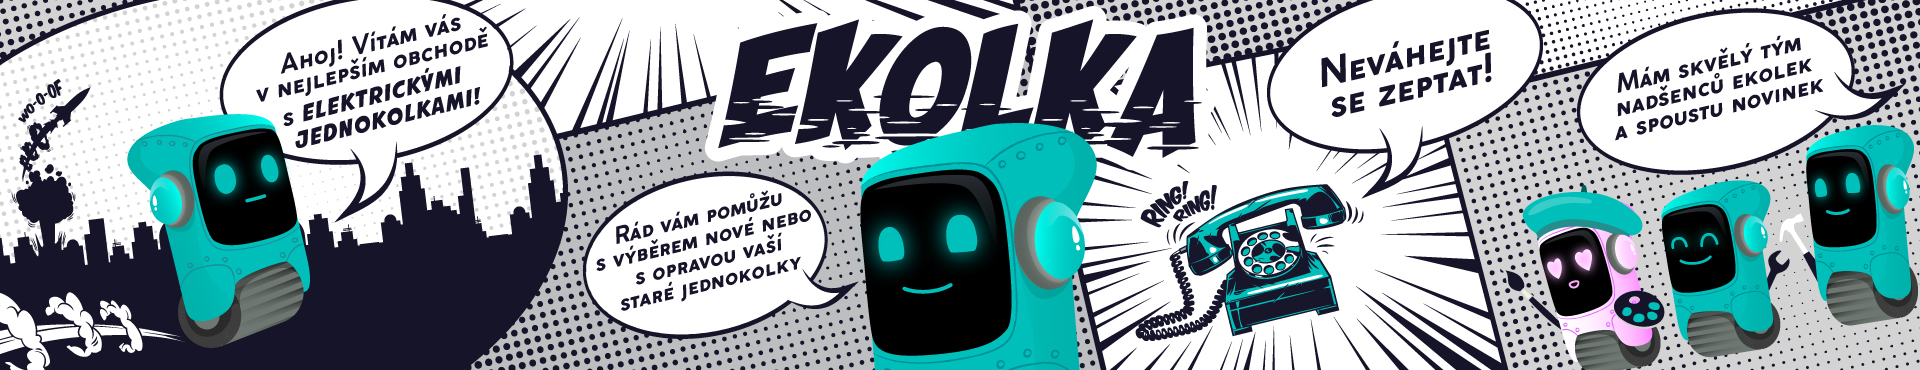 EKOLKA.CZ - Elektrické jednokolky KingSong, GotWay, Inmotion, Veteran, Ninebot